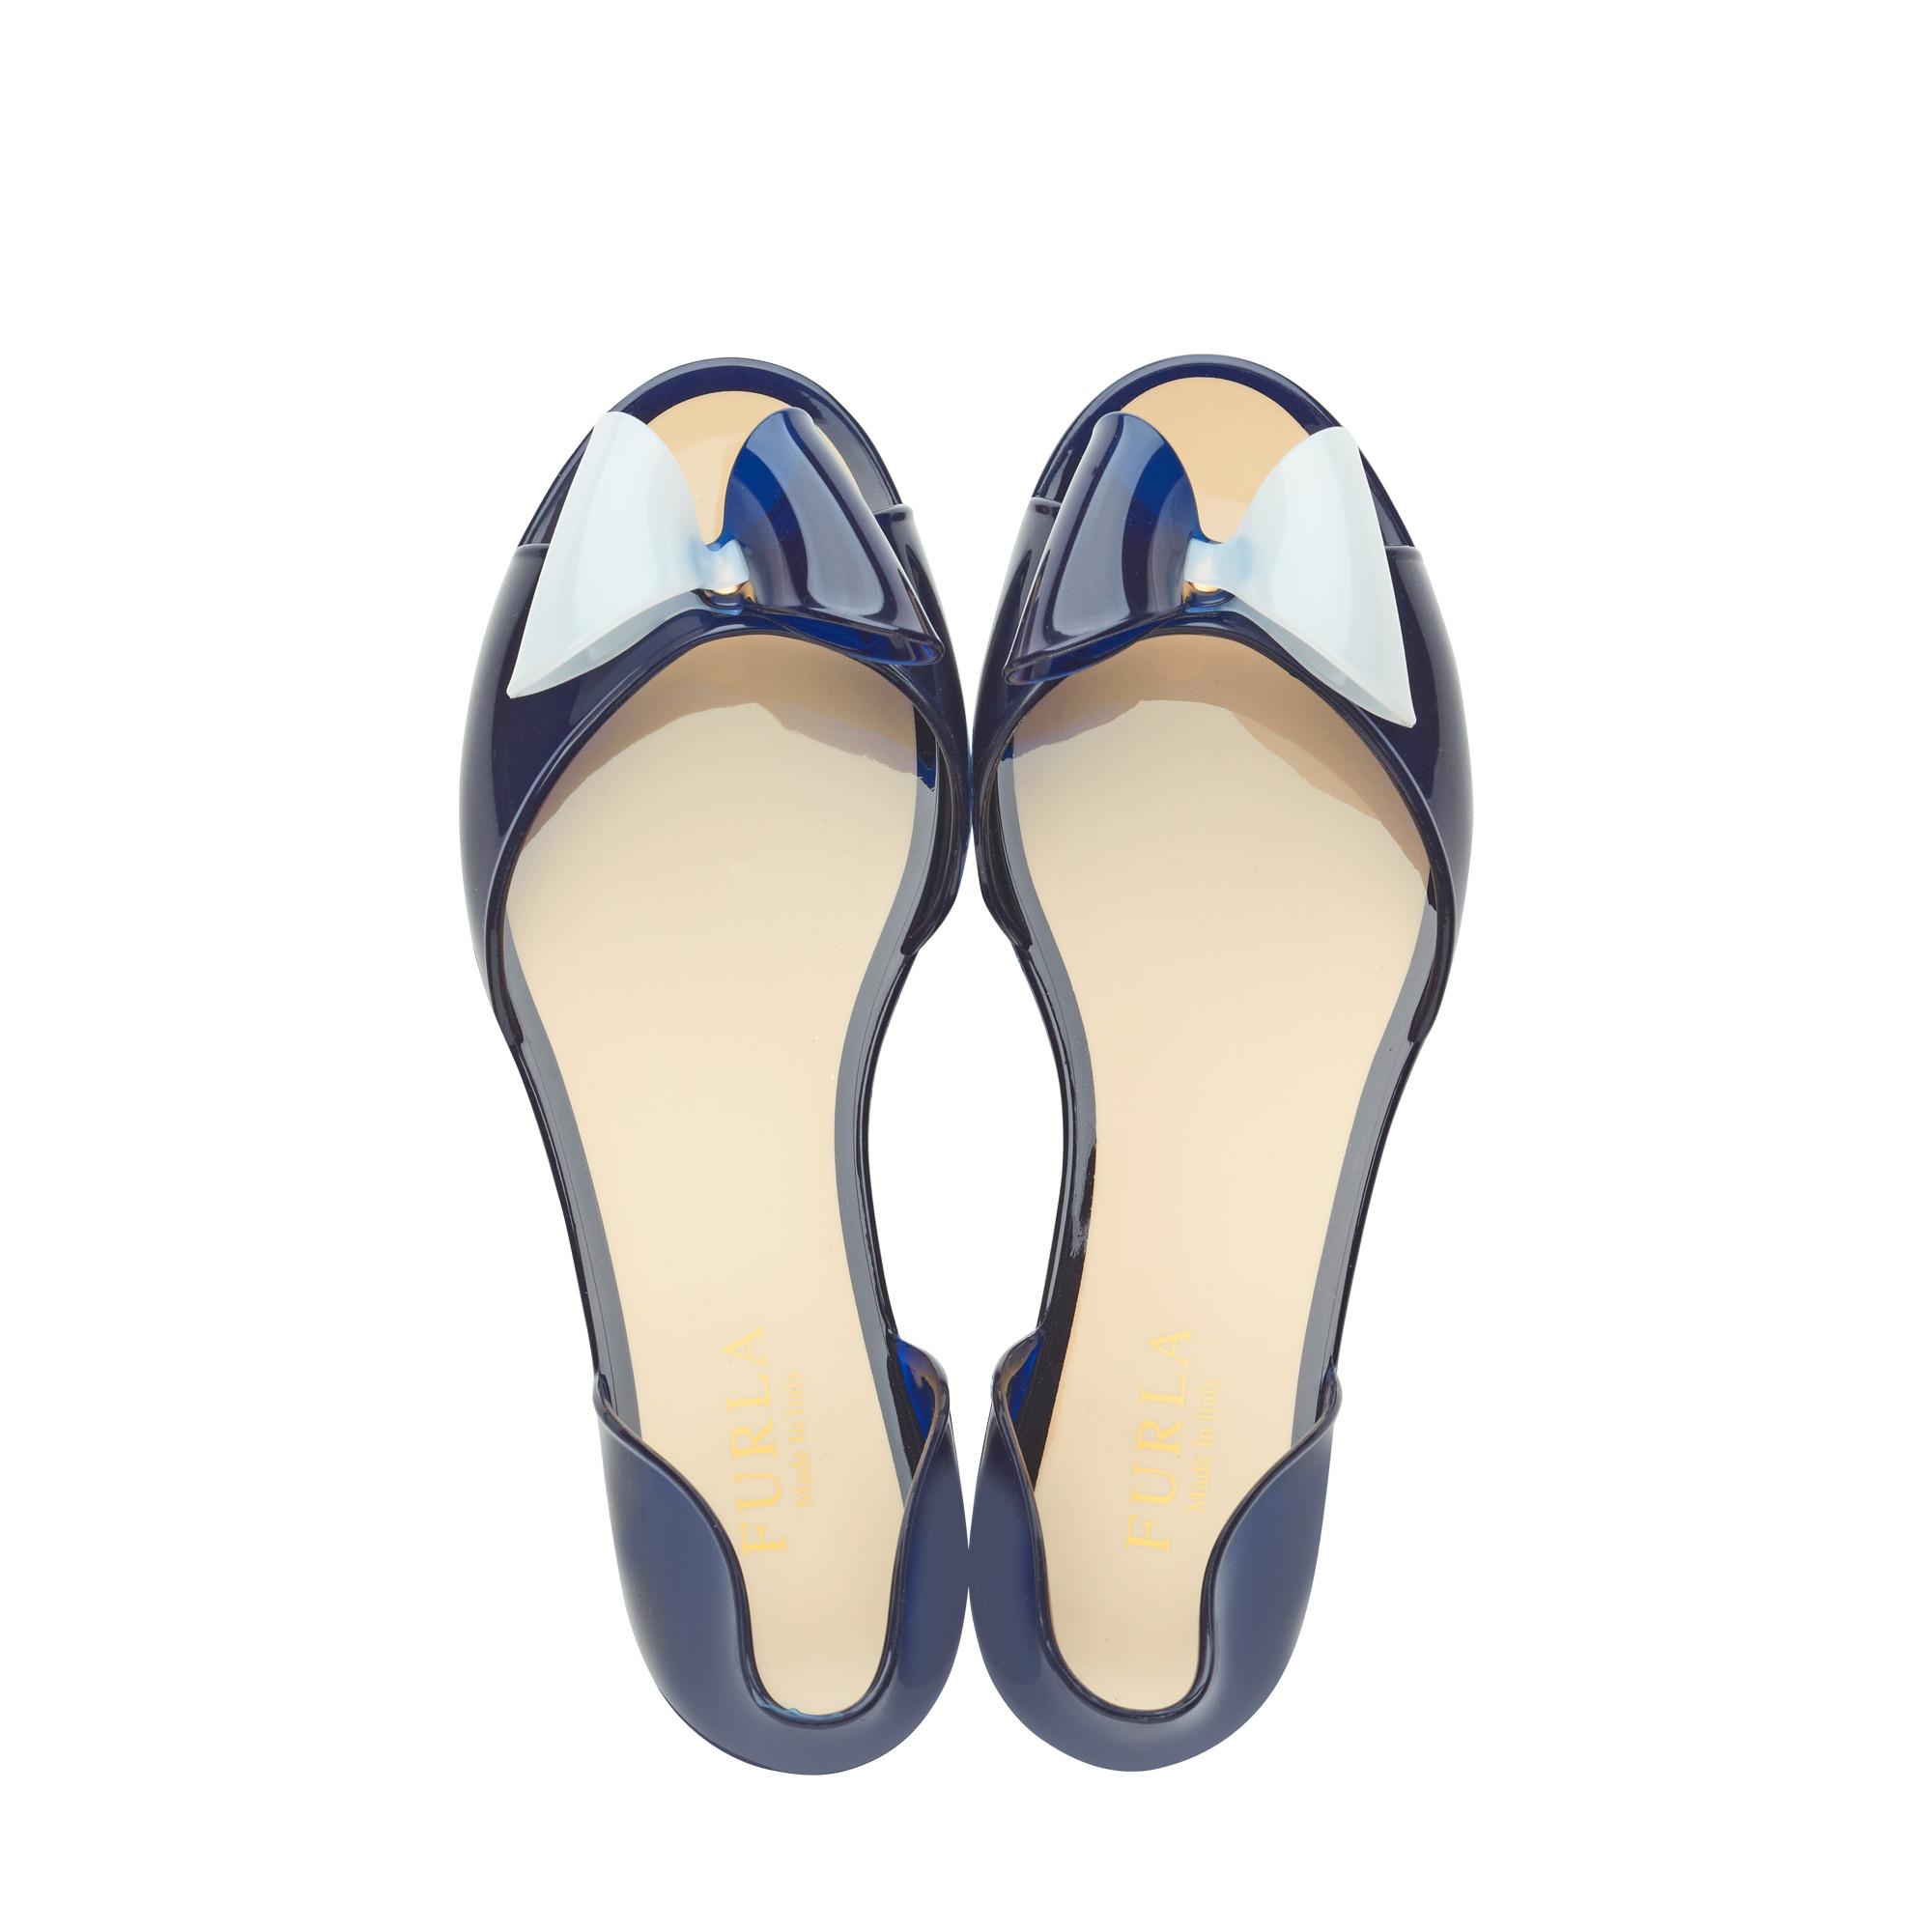 2be4622273b2 Furla Alissa Jelly Sandals in Blue - Lyst